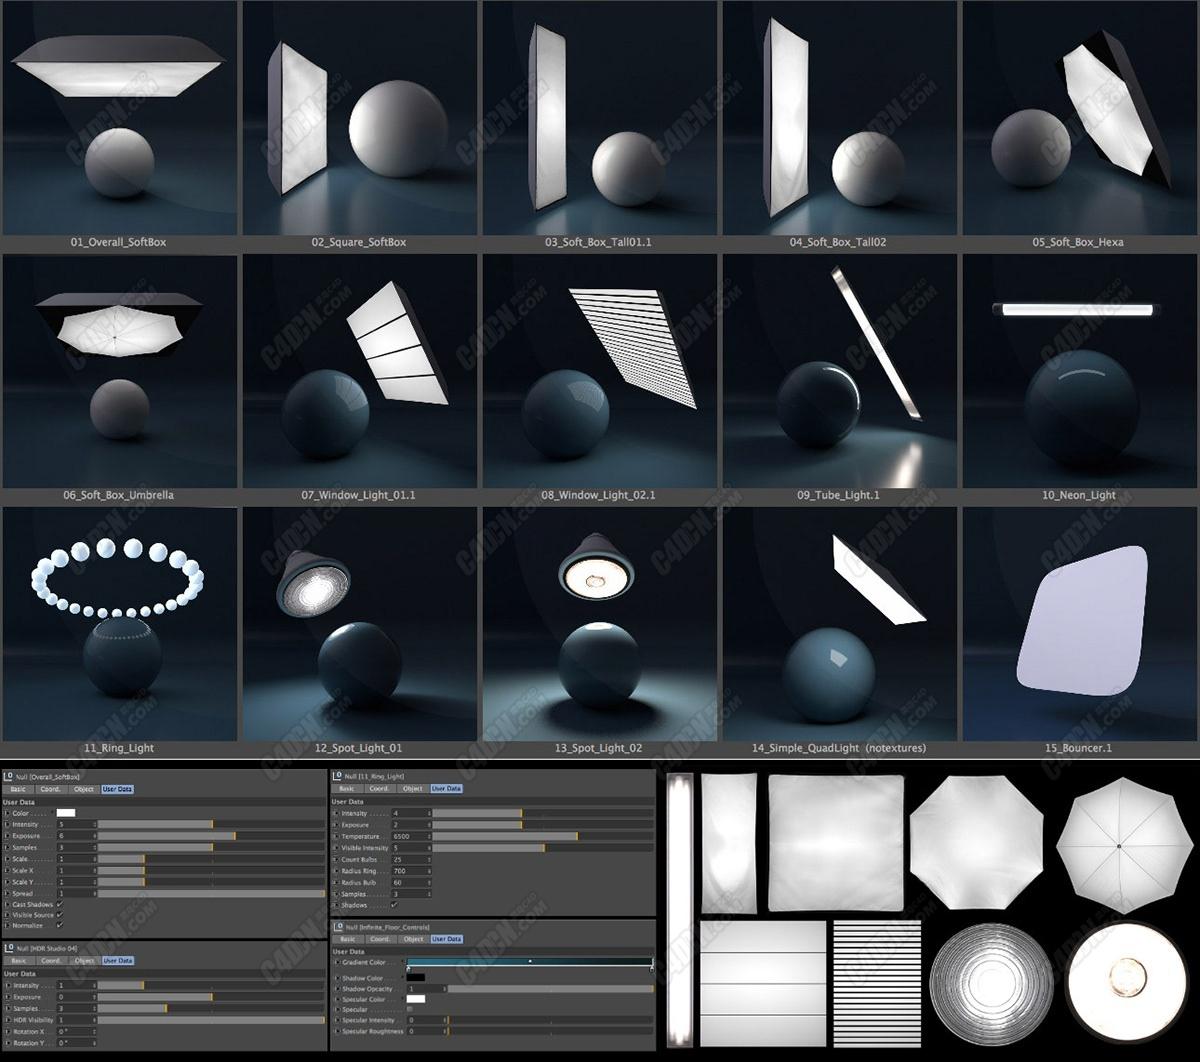 C4D阿诺德渲染器场景渲染HDR预设大合集 HDR rendering C4D presets